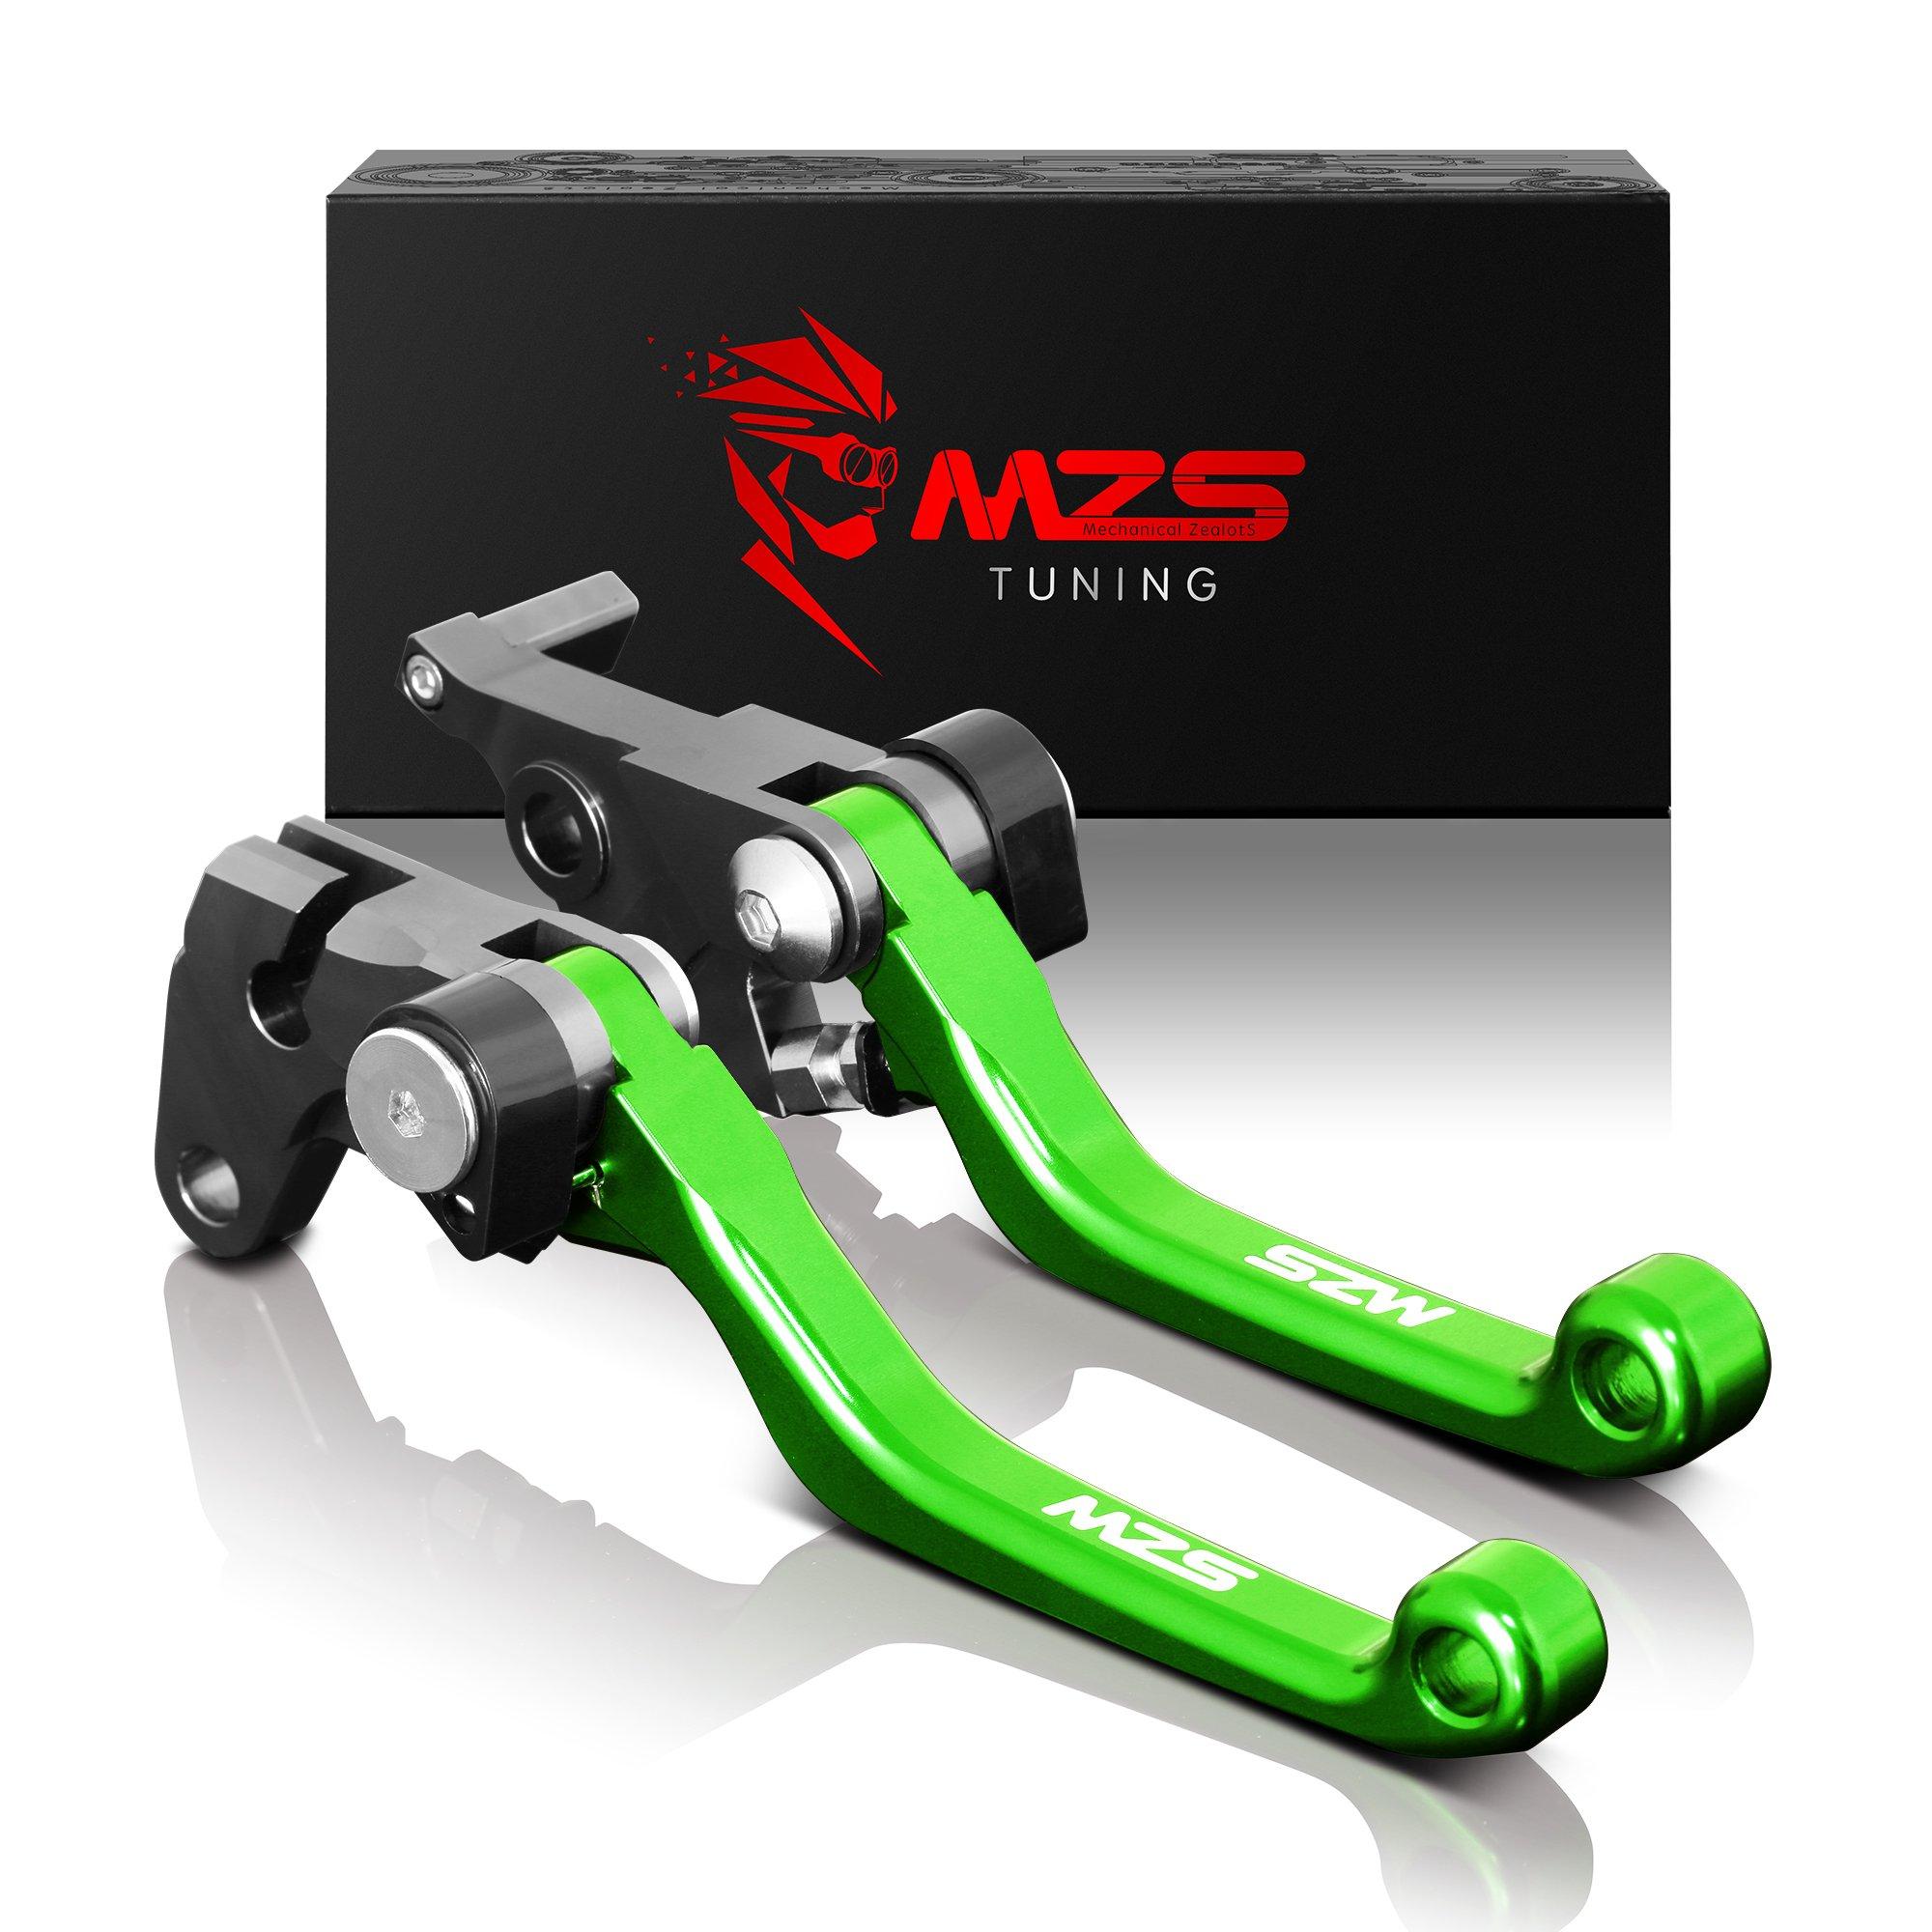 MZS Pivot Levers Brake Clutch CNC for Kawasaki KX65 2000-2019/ KX85 2001-2019/ KX100 2001-2019/ KX125 2000-2005/ KX250 2000-2004/ KX250F 2004 (Green)